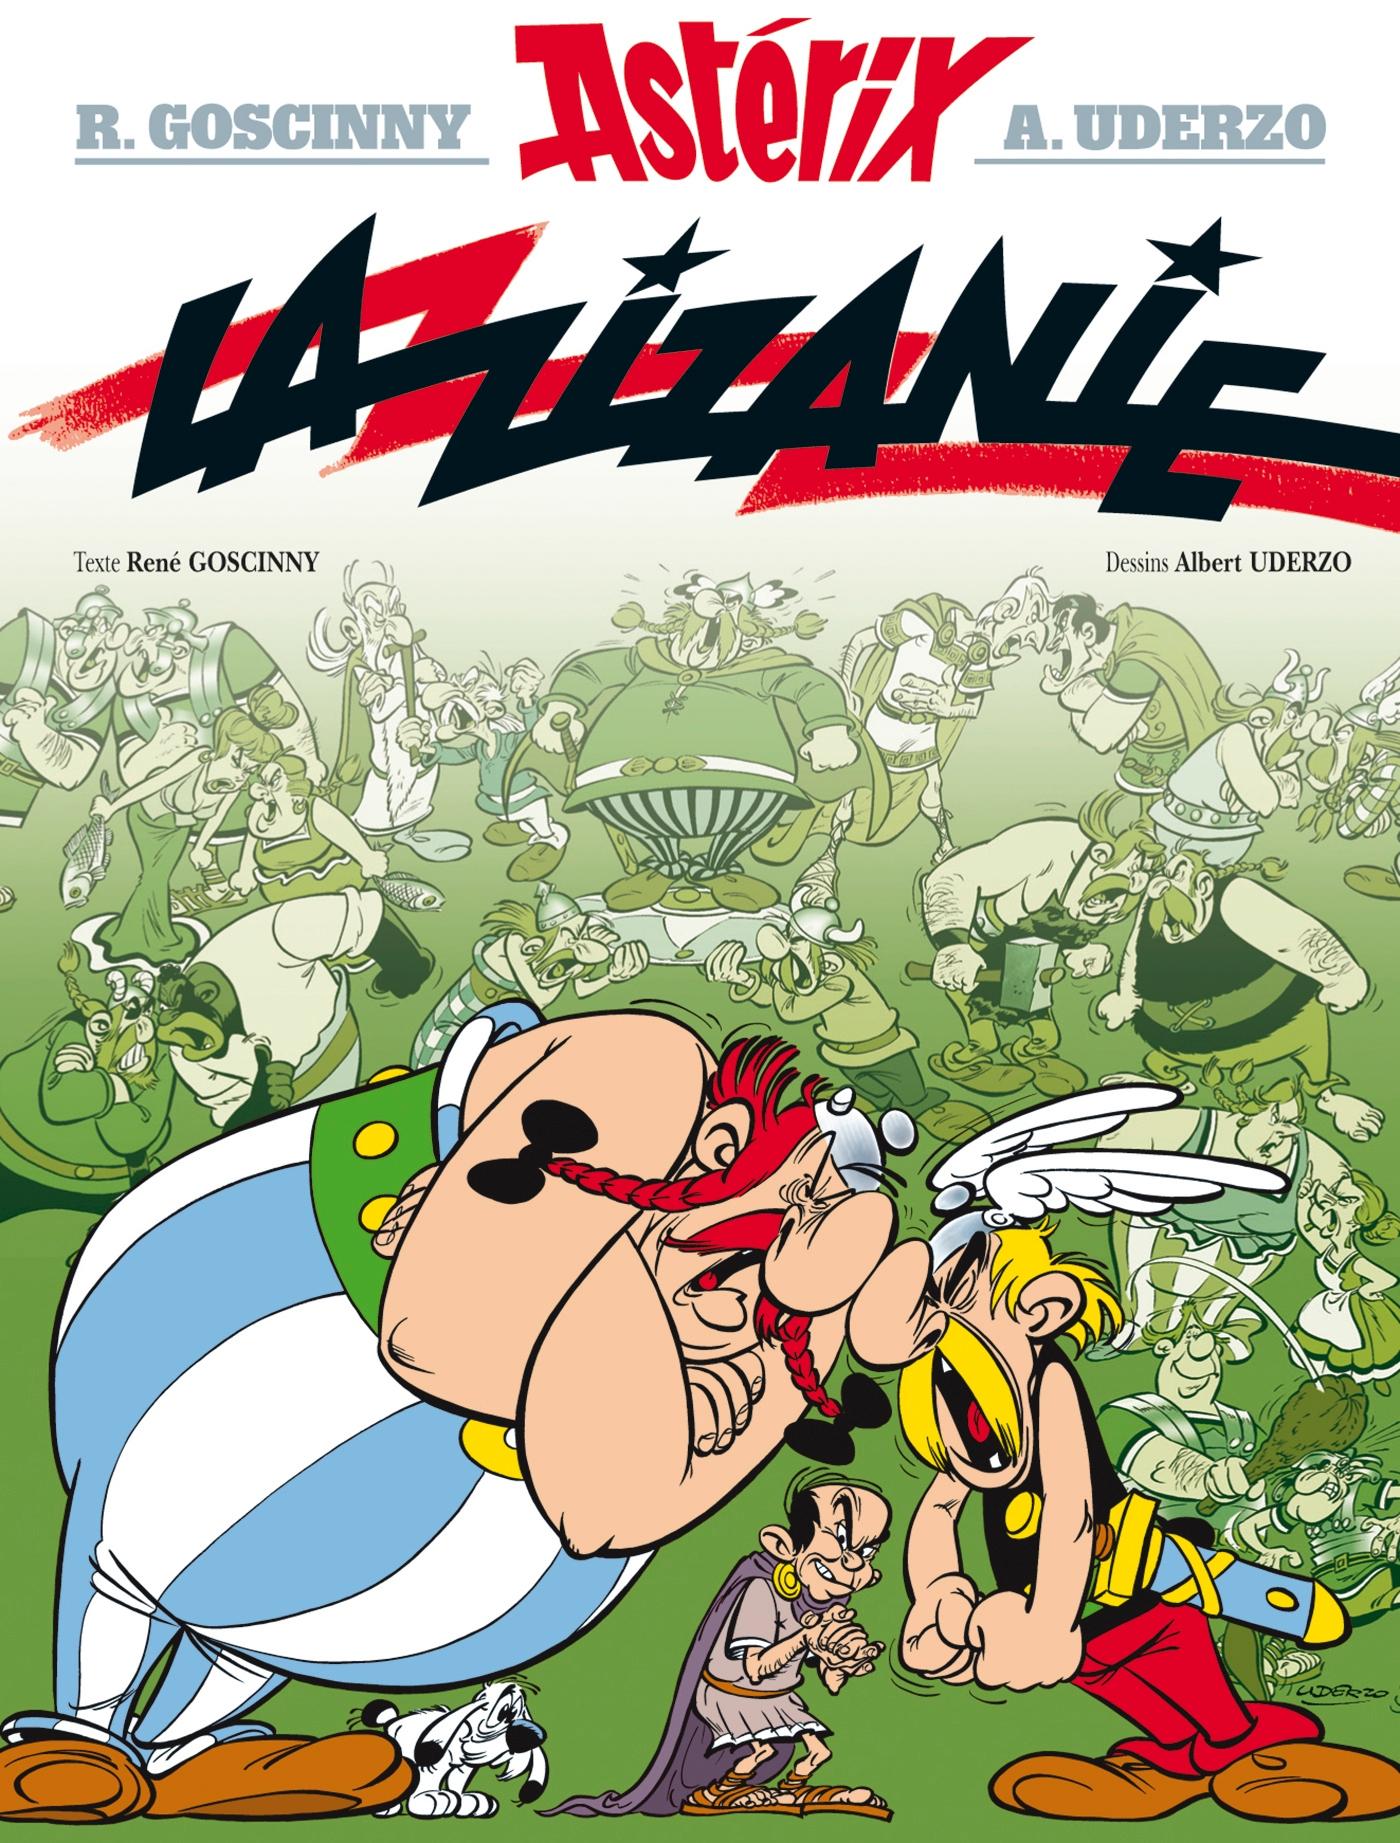 Astérix - La Zizanie - n°15 | Goscinny, René. Auteur